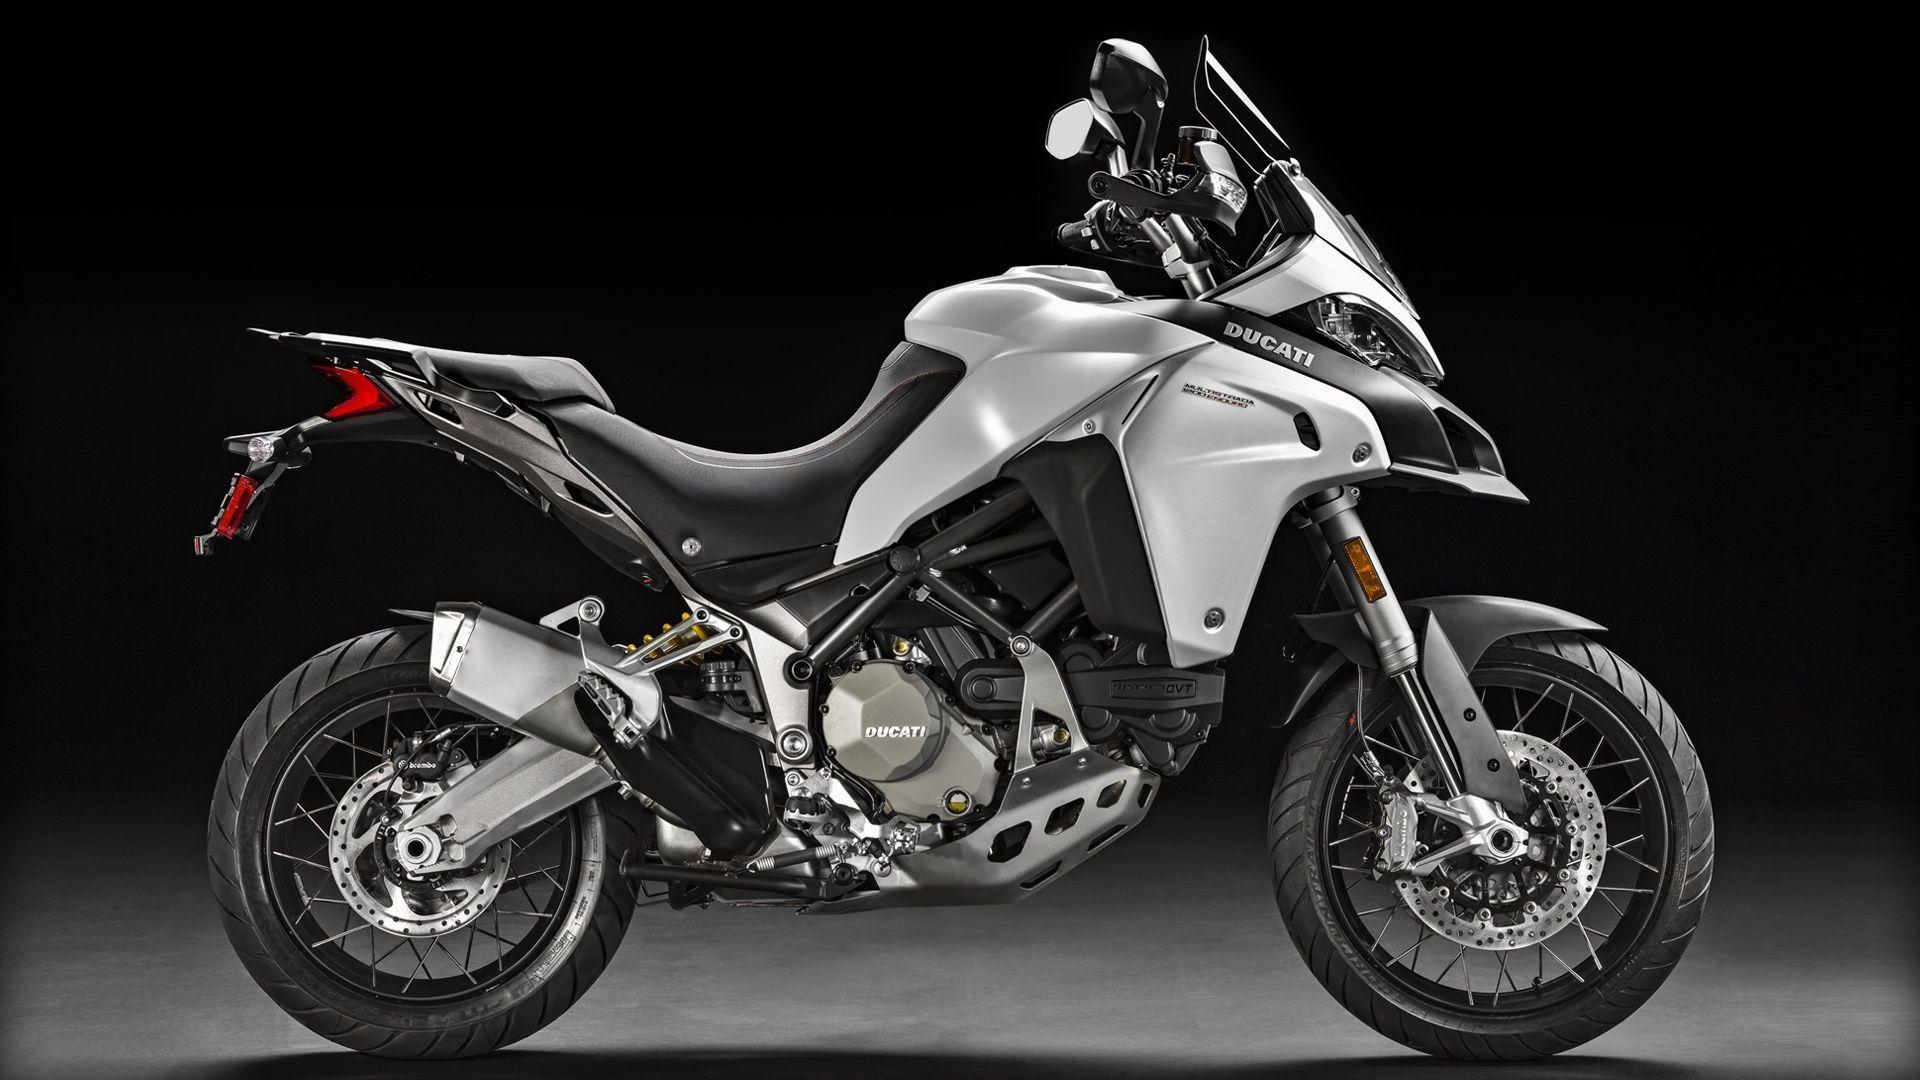 2016 Ducati Multistrada 1200 Enduro | Multistrada 1200 Enduro - Side View